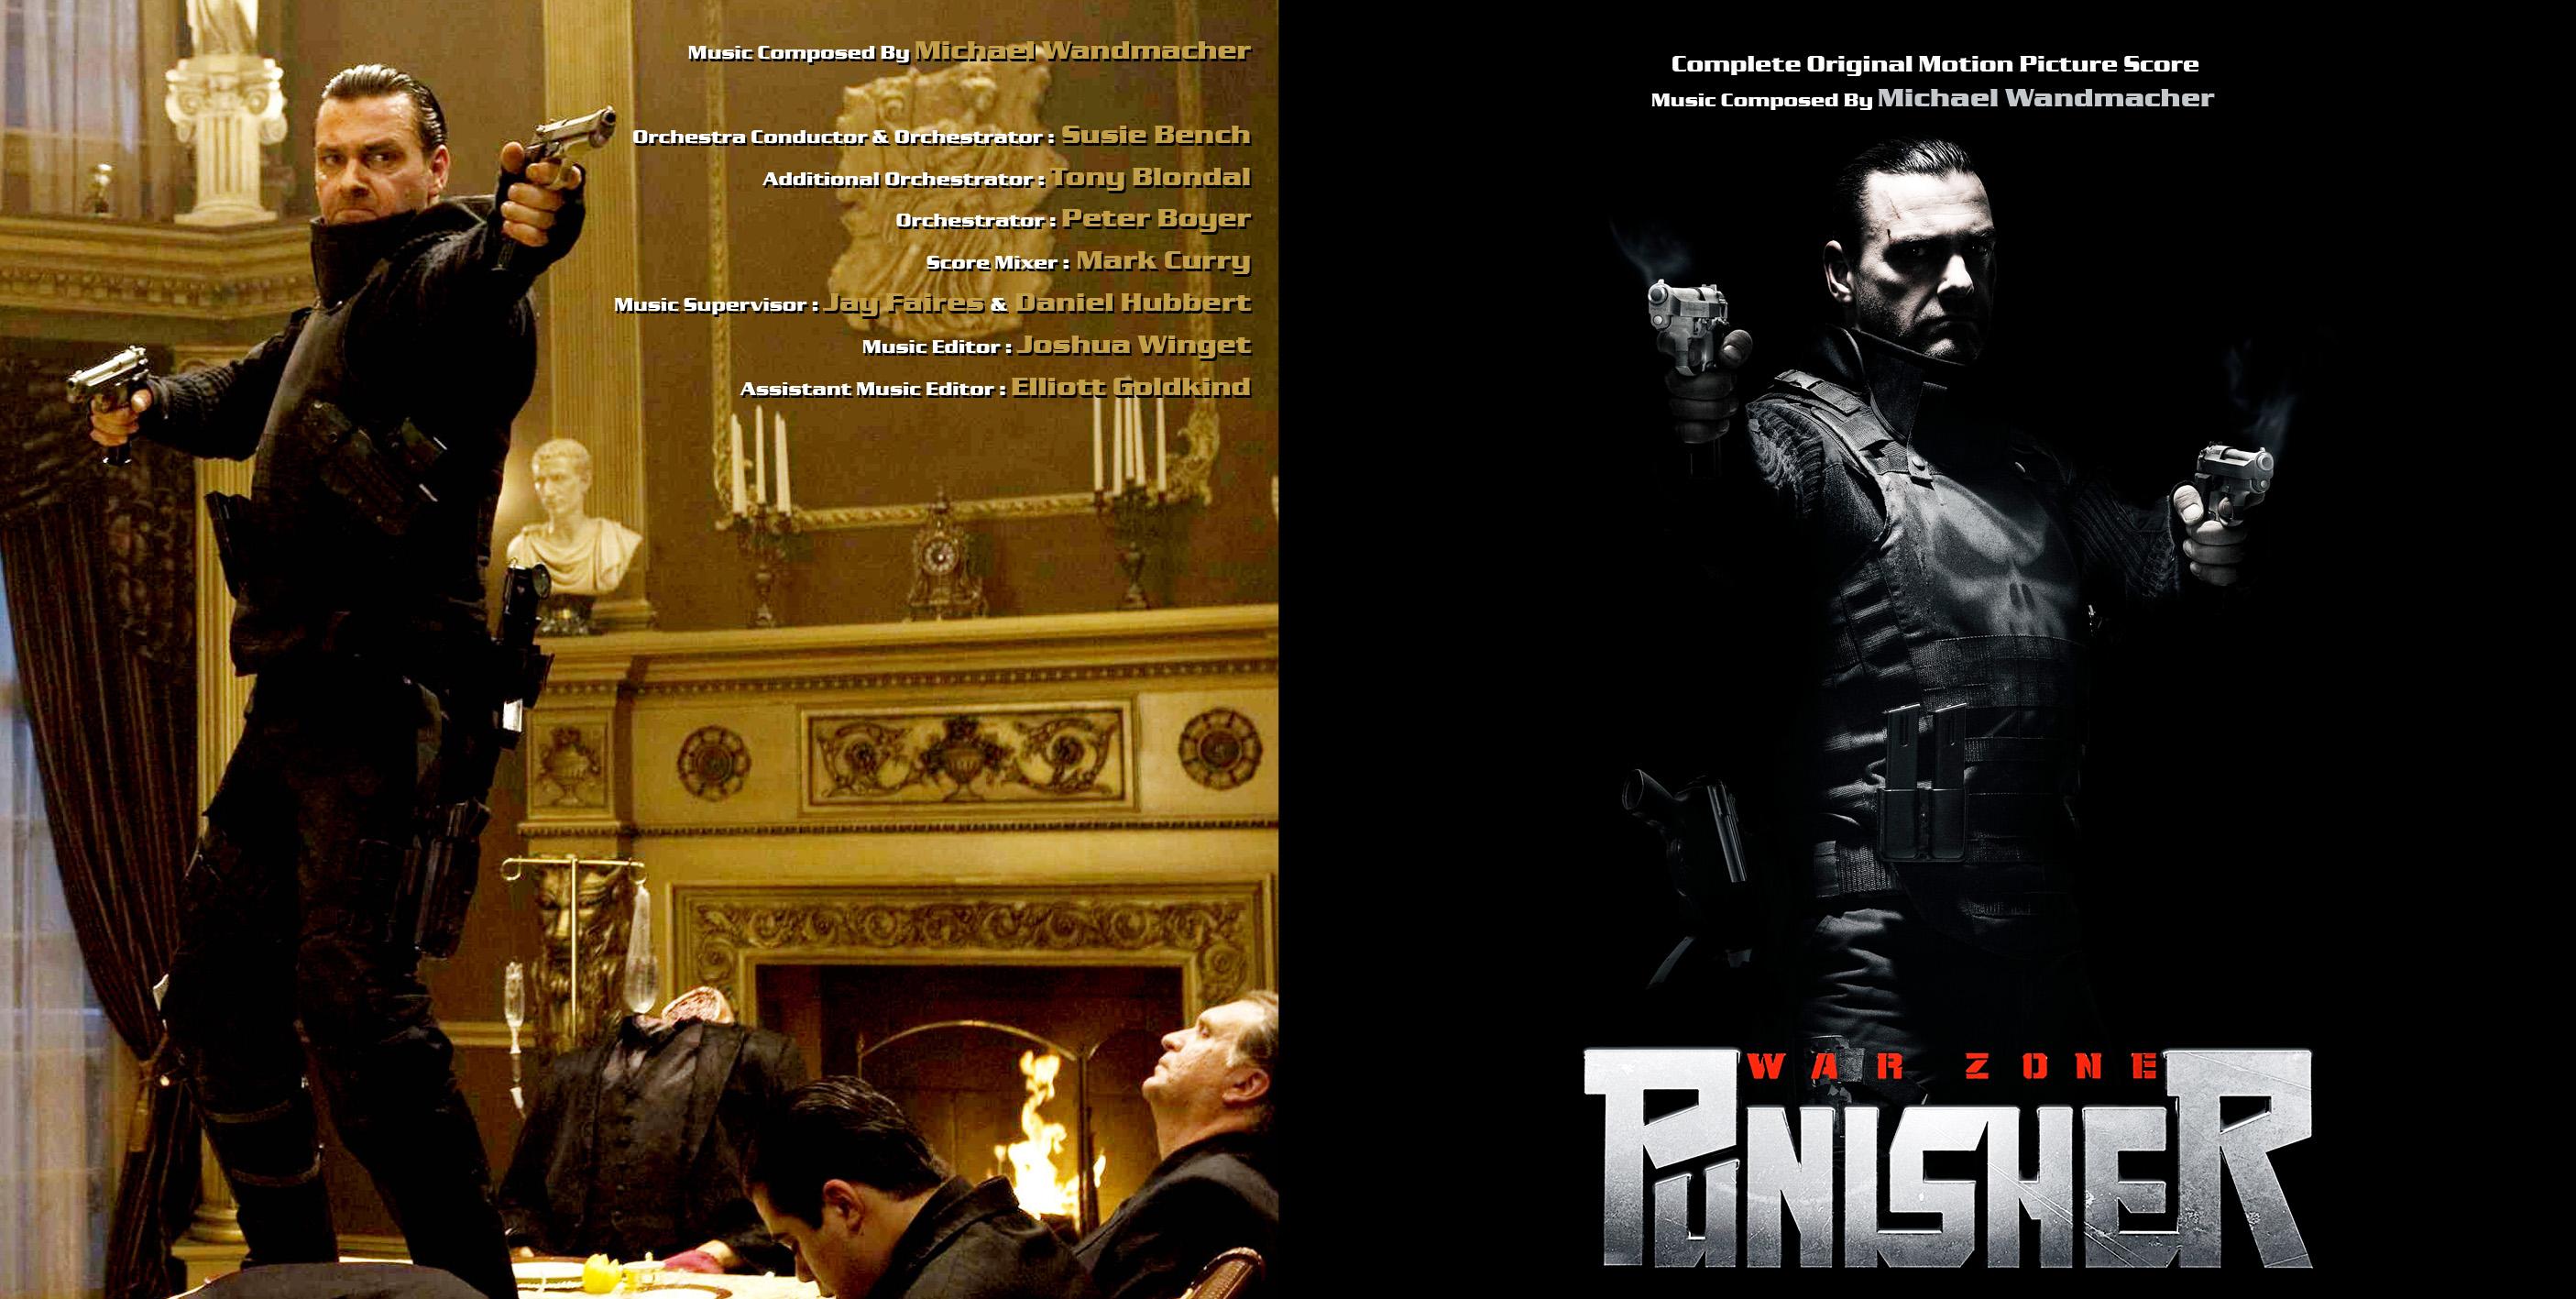 Punisher: War Zone Original Motion Picture Score - Wikipedia